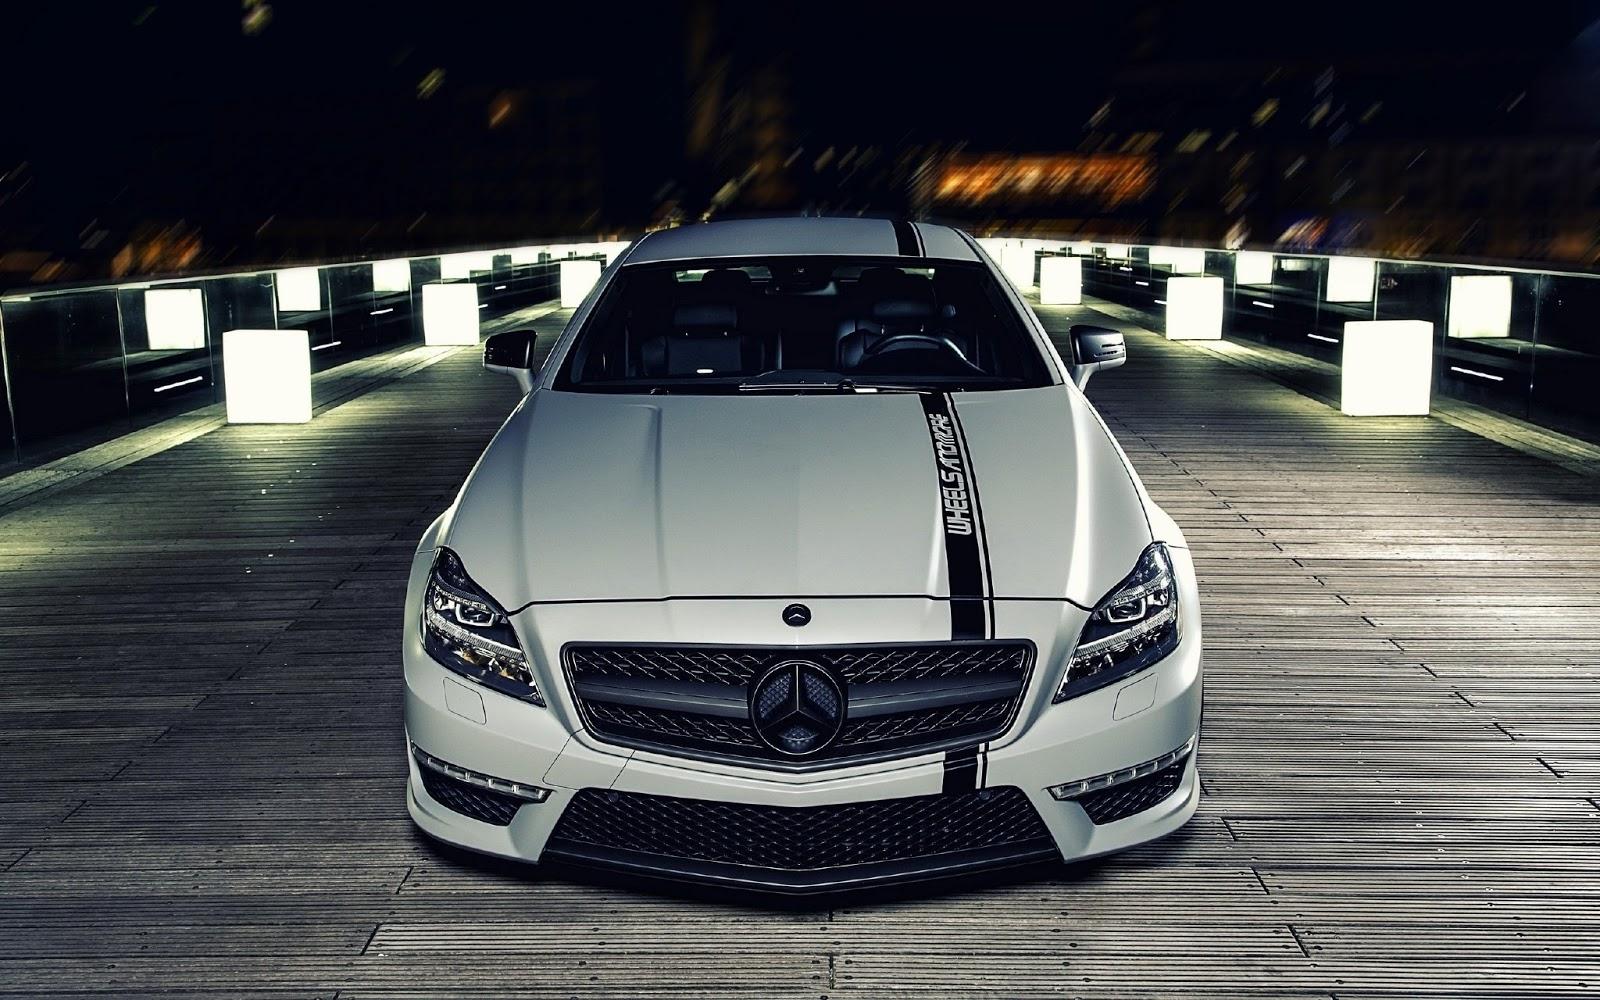 Mercedes Benz Wallpaper